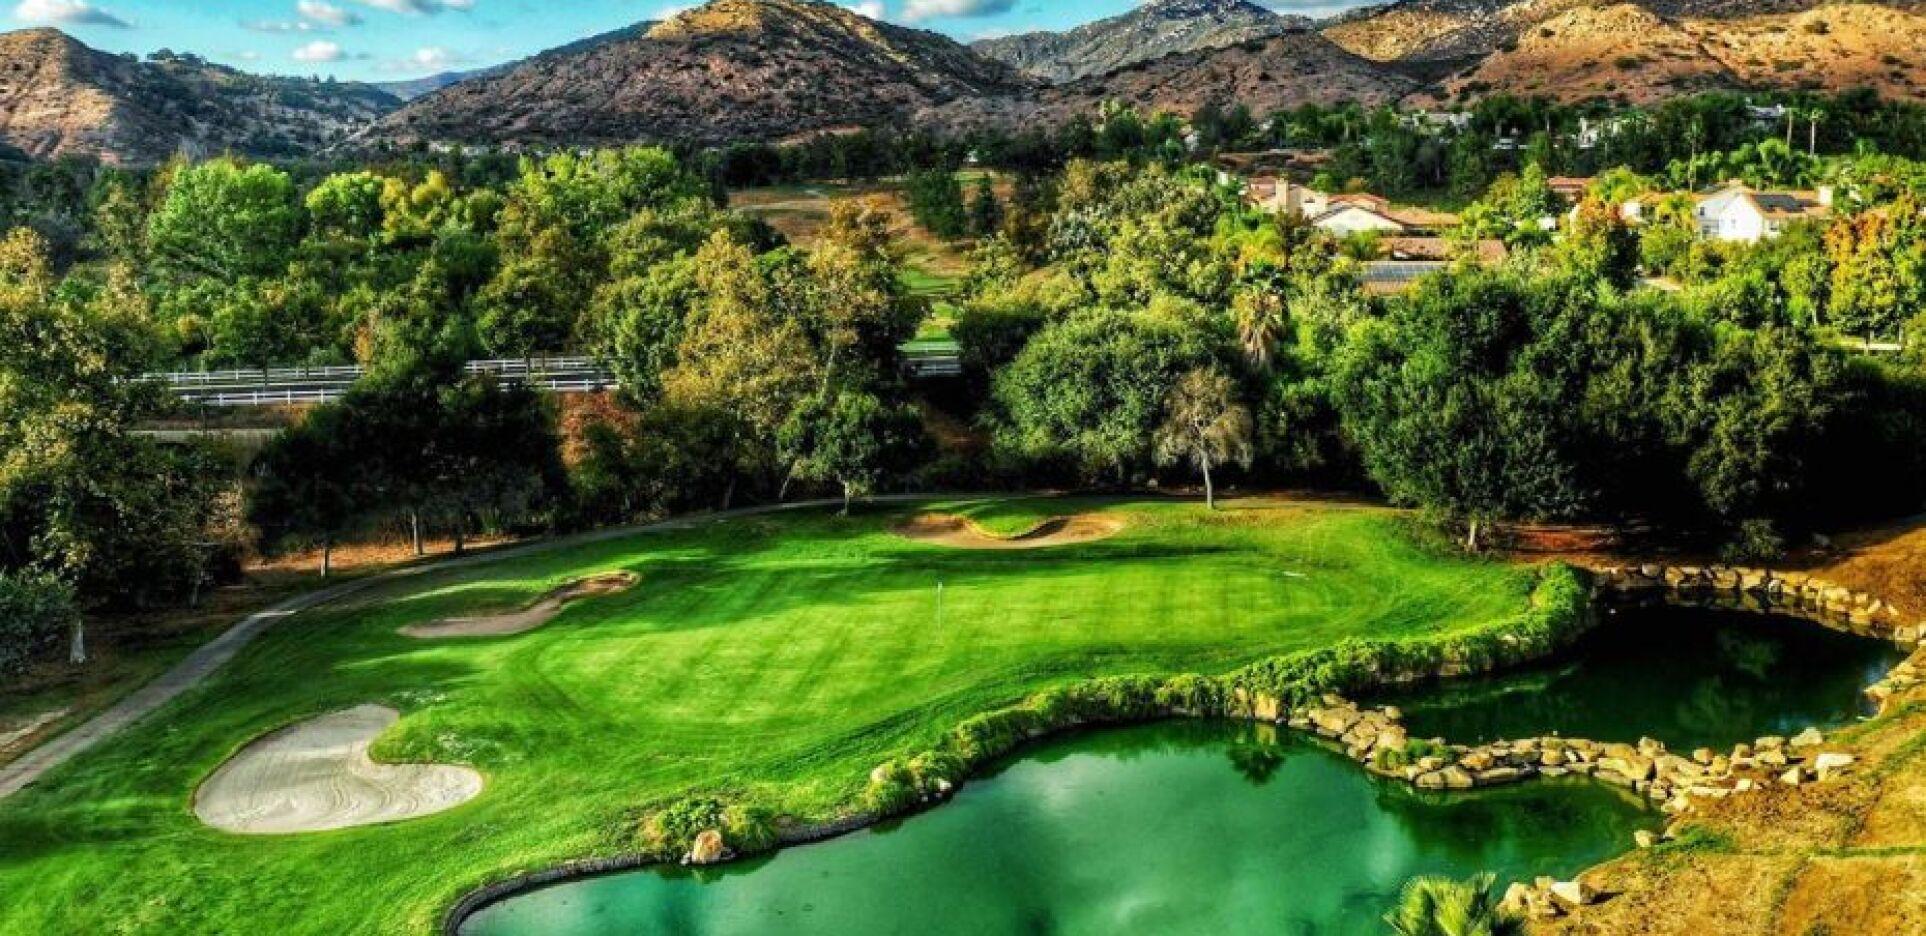 Eagle Crest Golf Club Hole 18  in Escondido, California